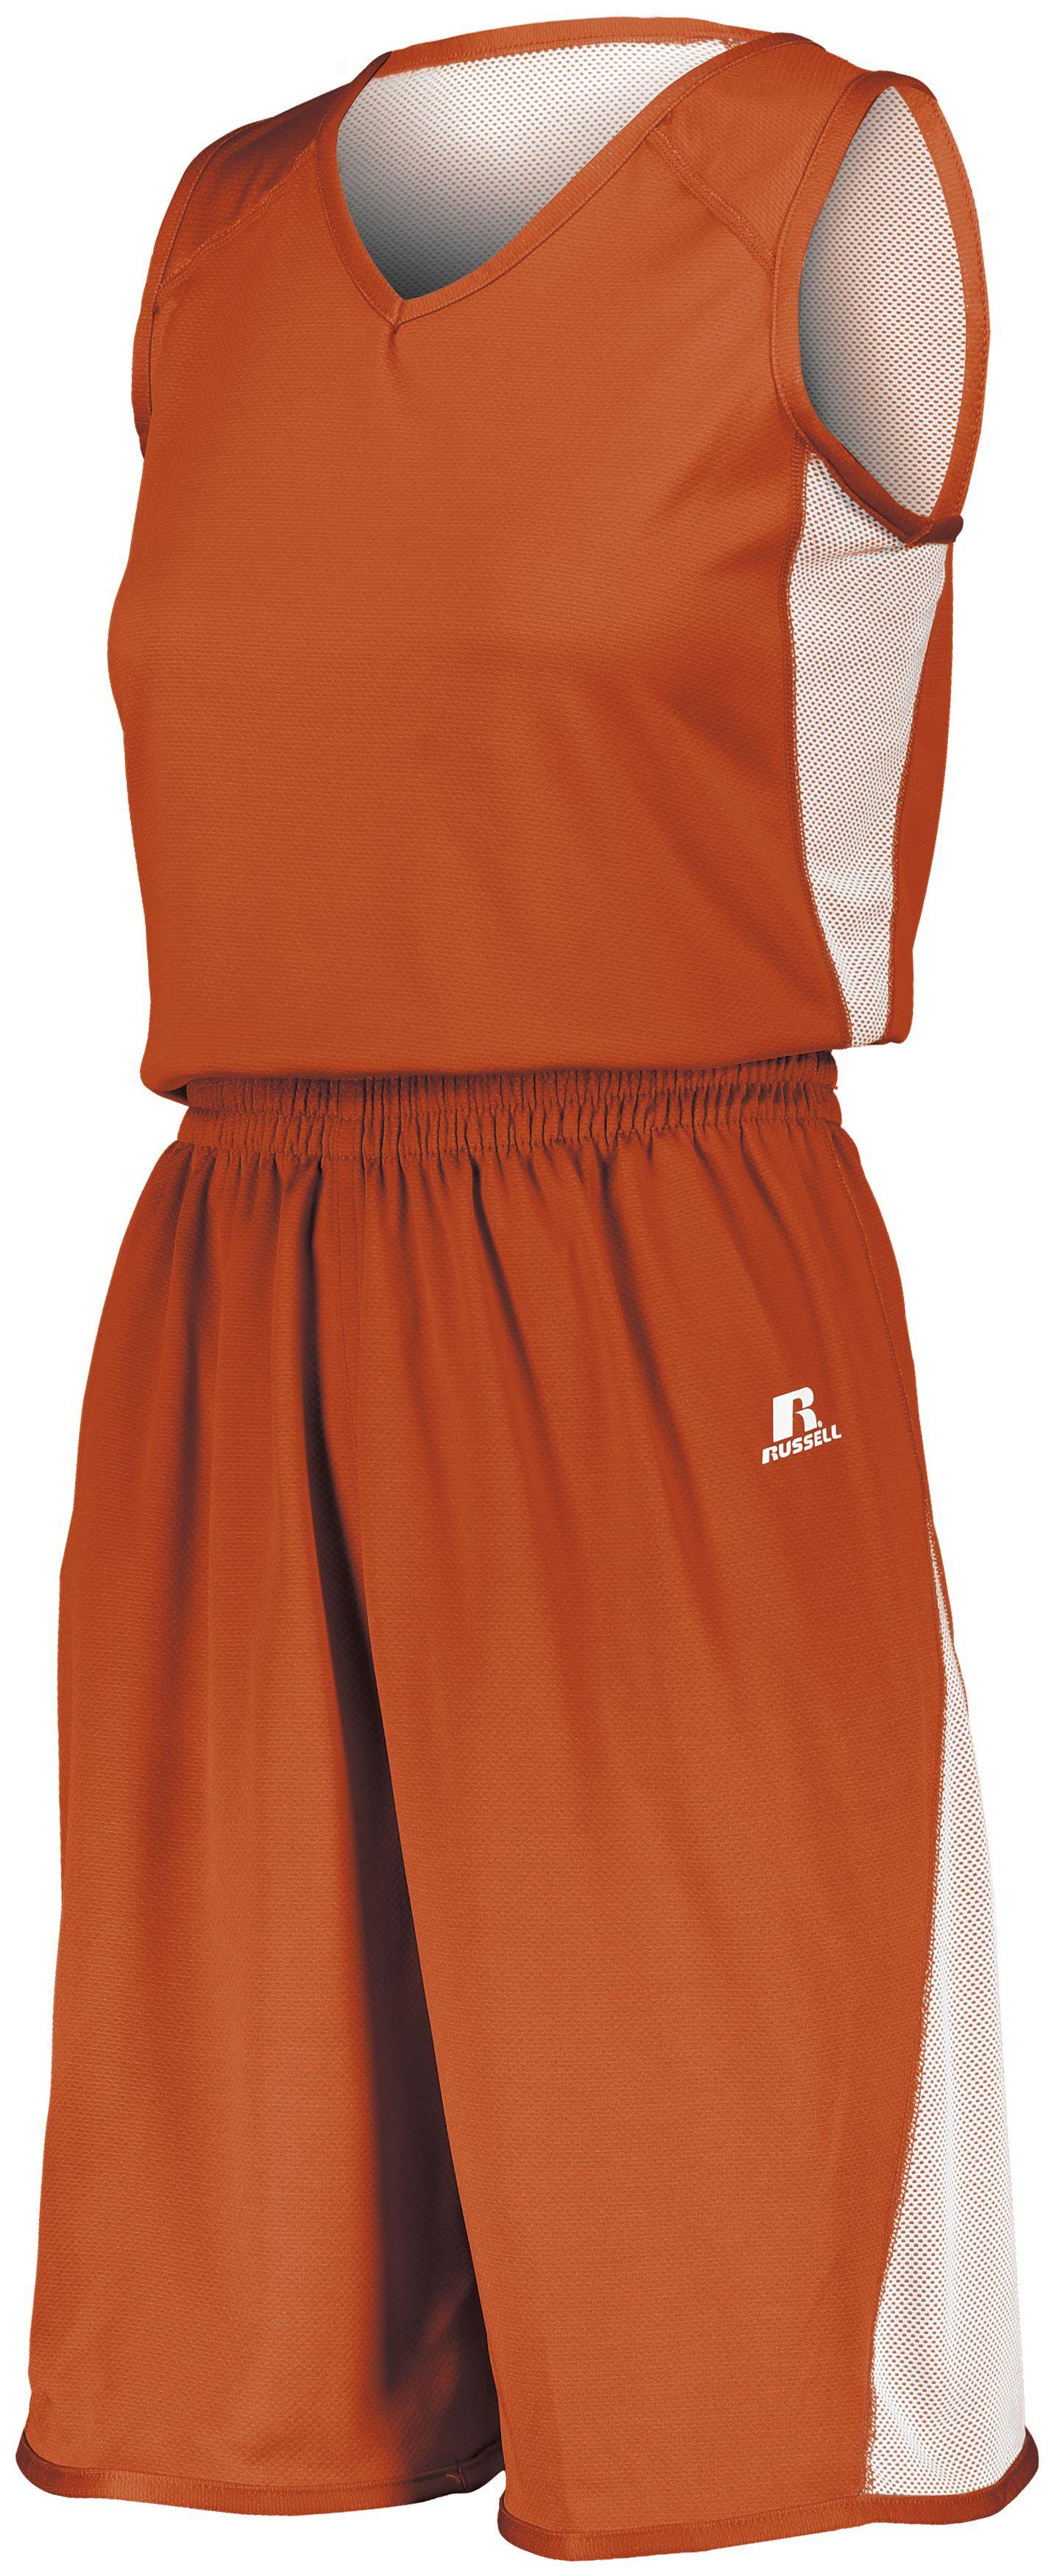 Ladies Undivided Single Ply Reversible Shorts - BURNT ORANGE/WHITE